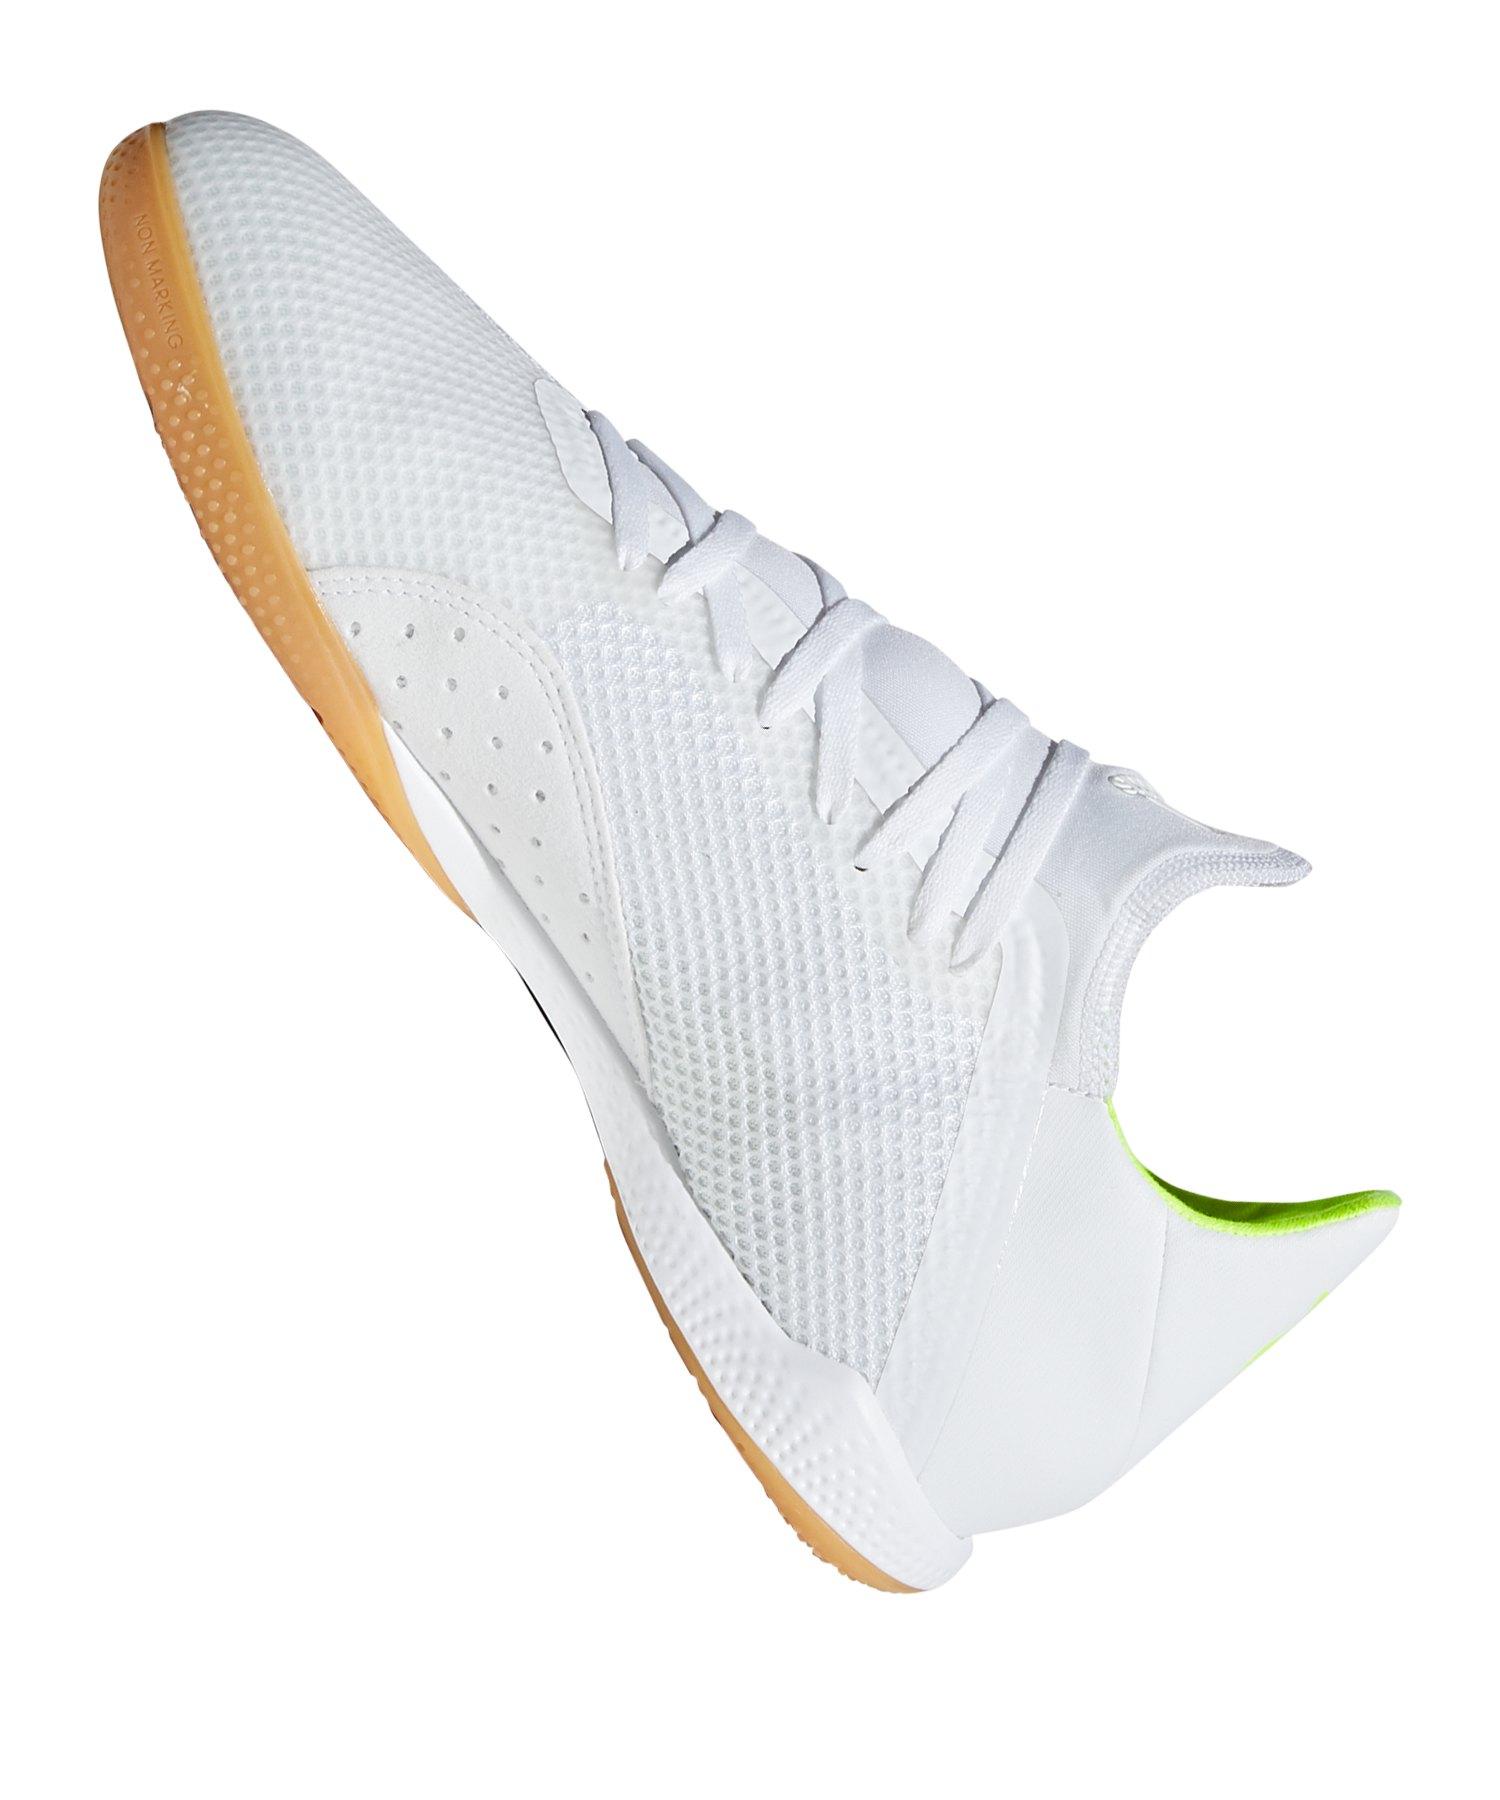 huge discount 01f35 60152 ... adidas X 18.3 IN Halle Weiss Gelb - weiss ...